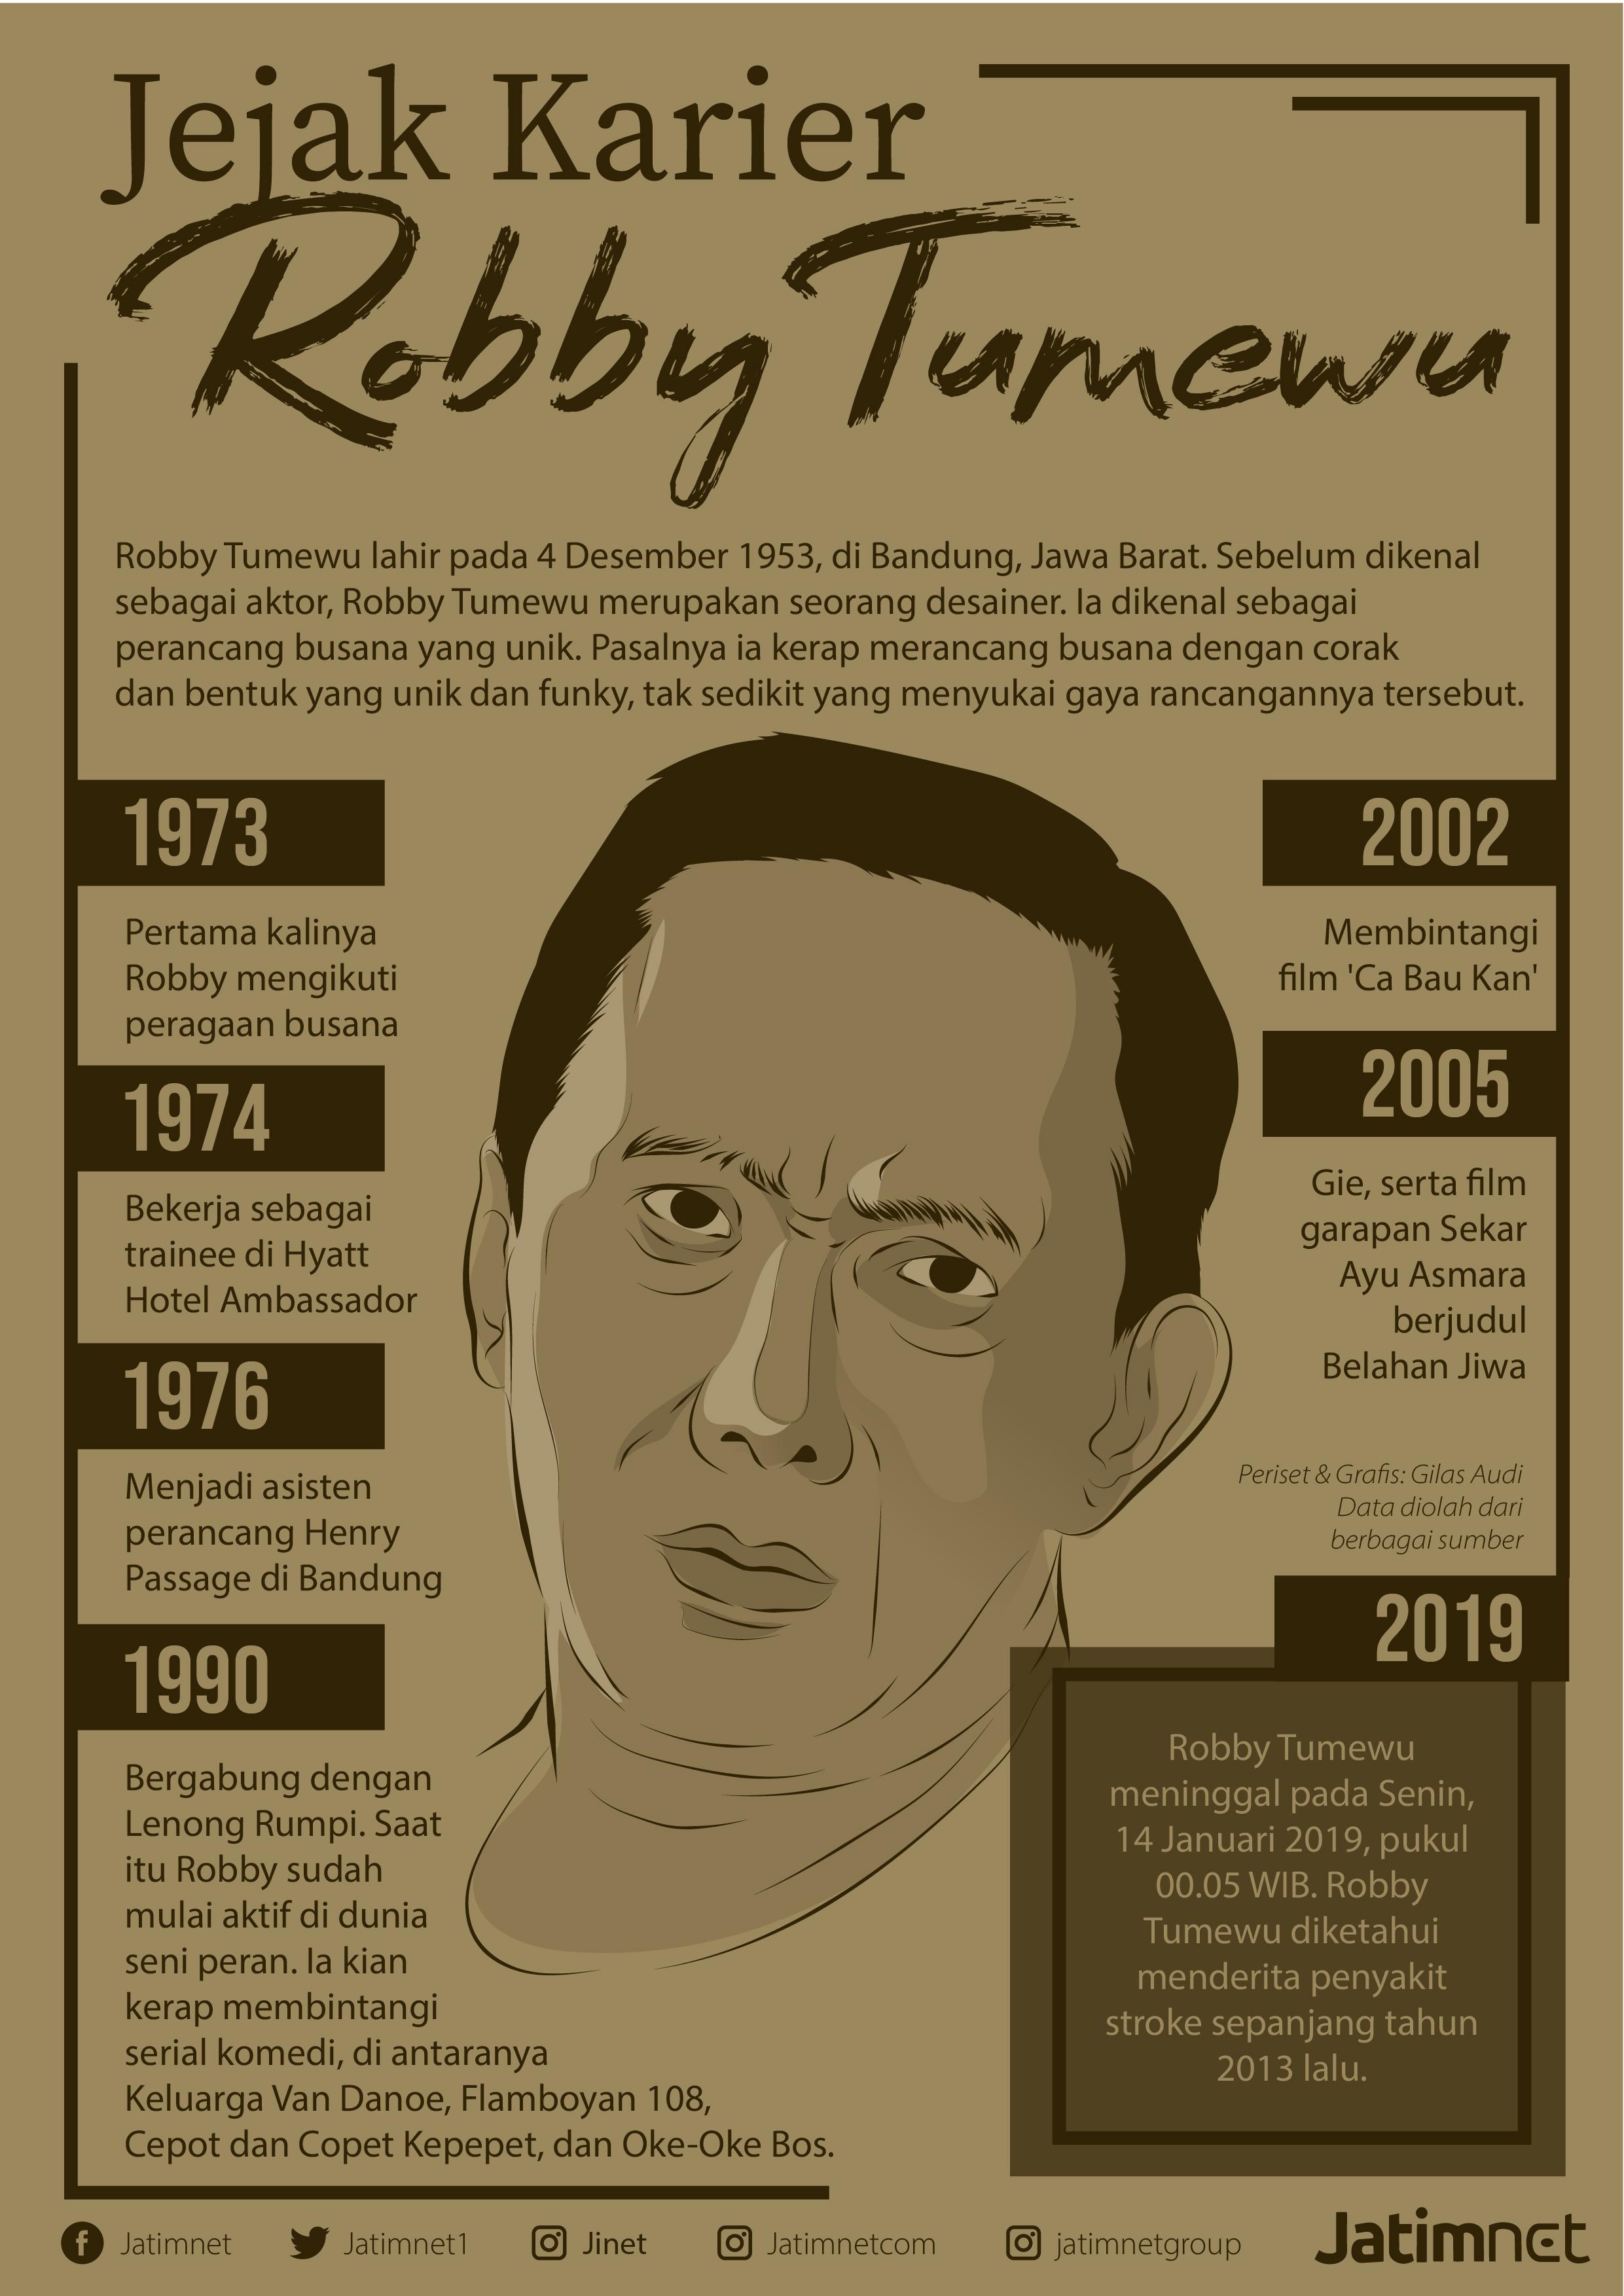 Selamat Jalan Robby Tumewu